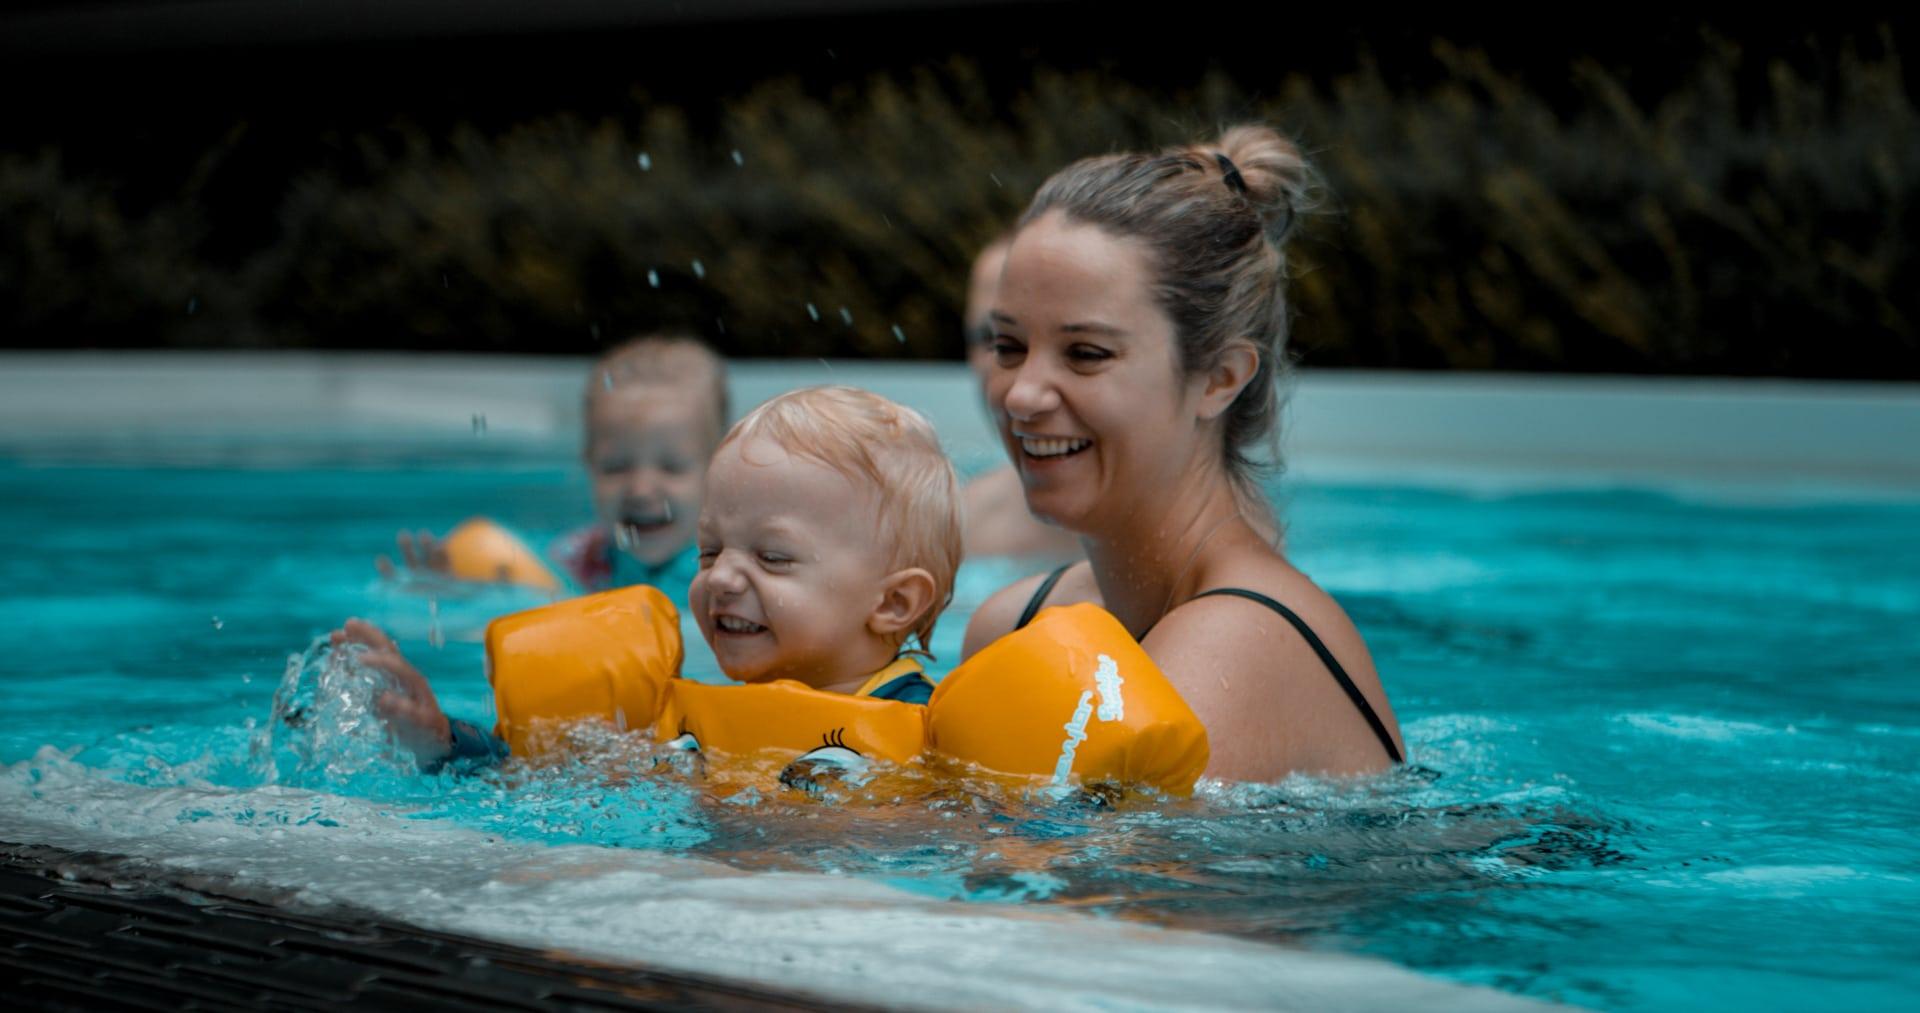 Familie im Novotel Pool Videographie für Imagefilm